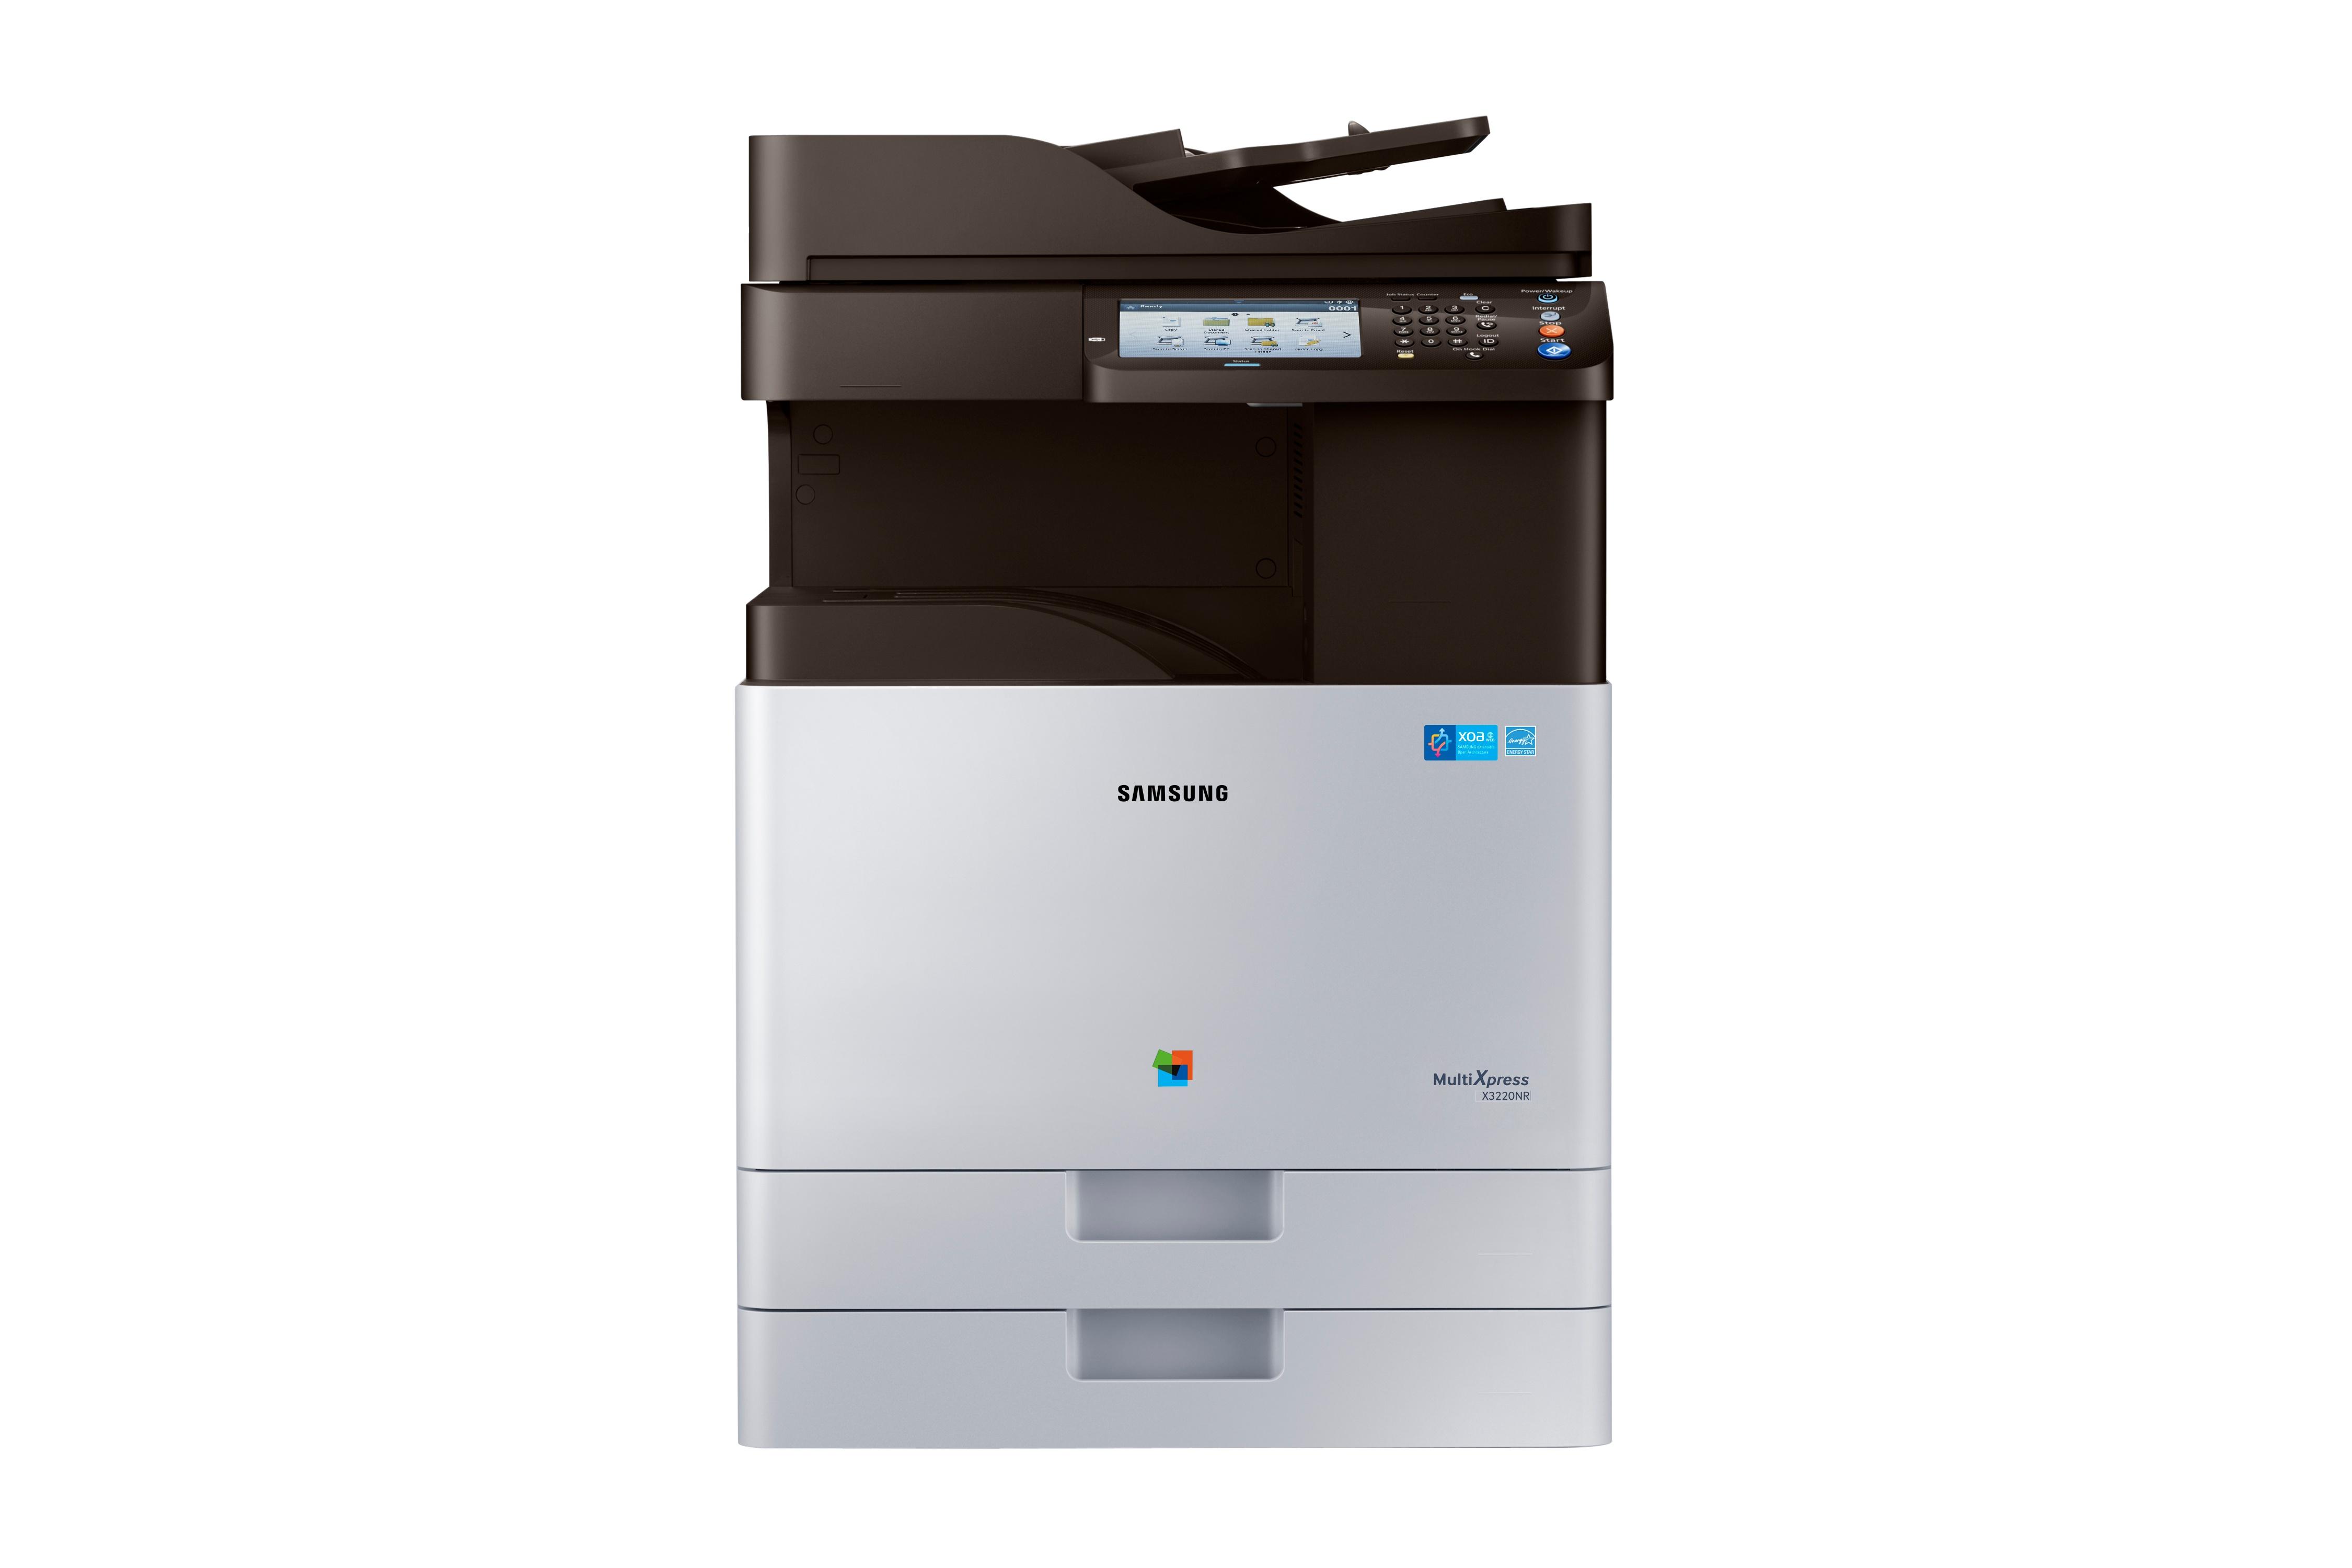 Samsung X3280 Image.jpg